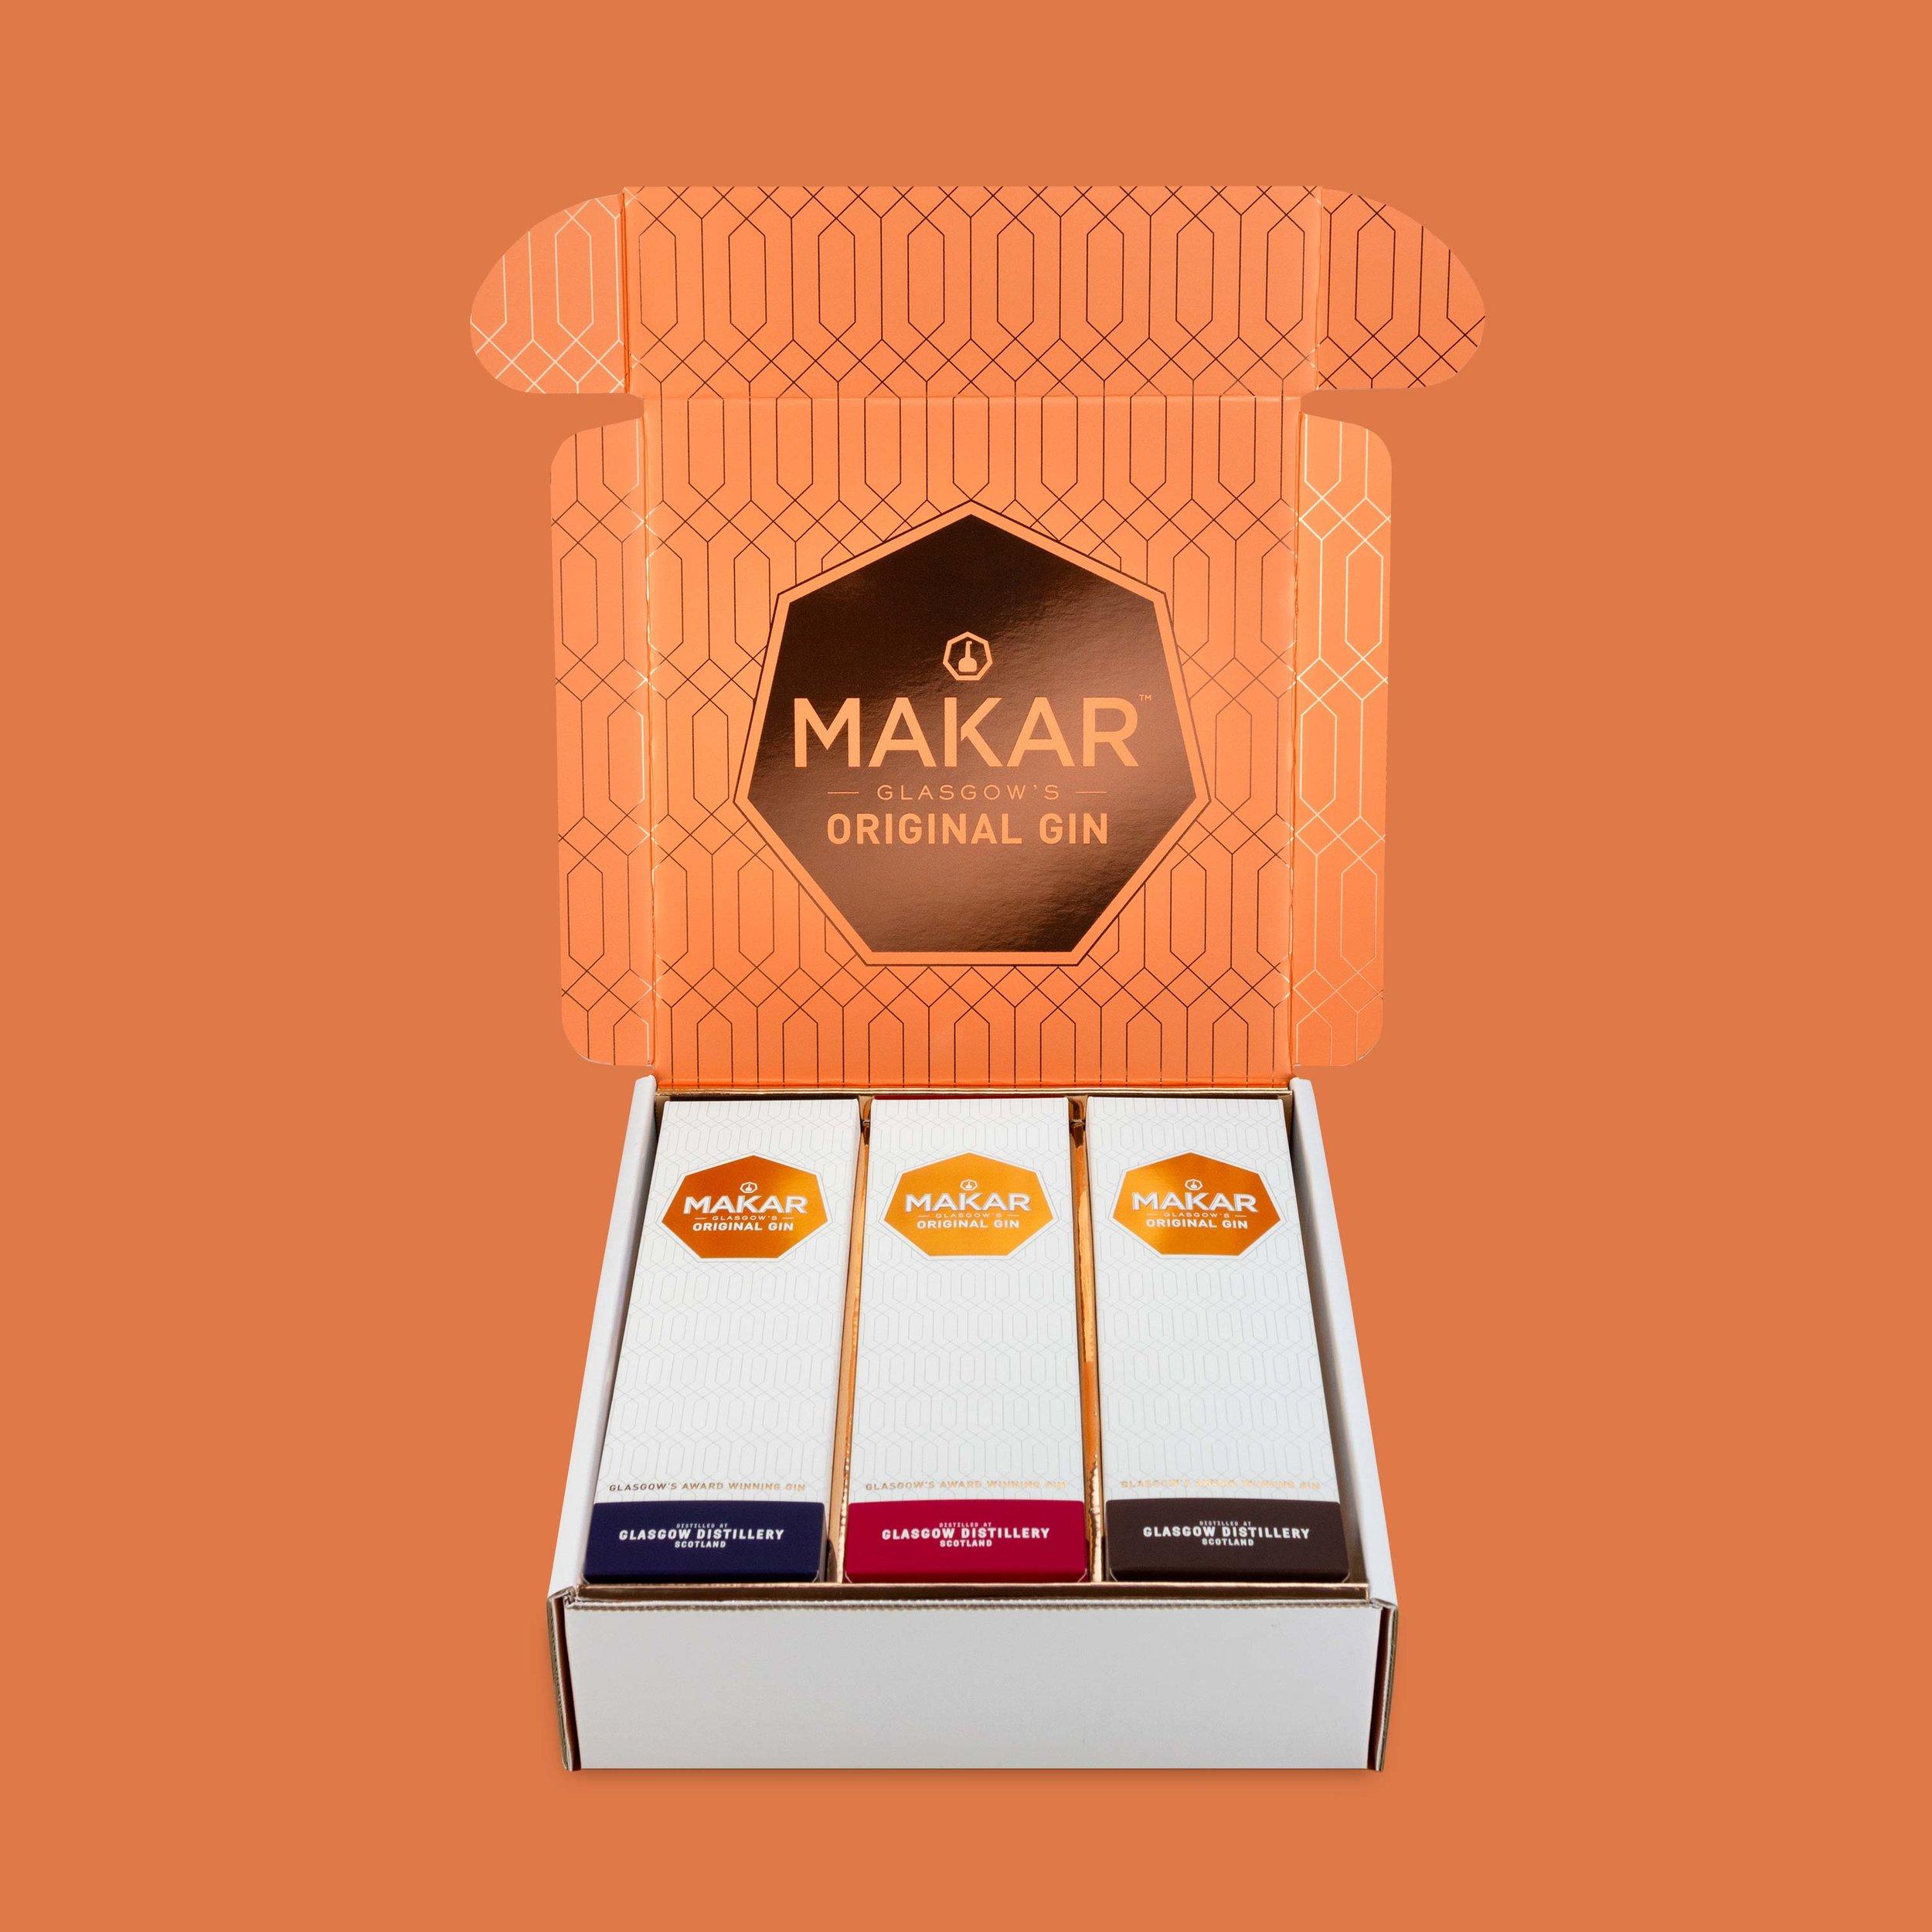 Makar-Gin-Wow-Box-Packaging-Design-Prototype-01.jpg